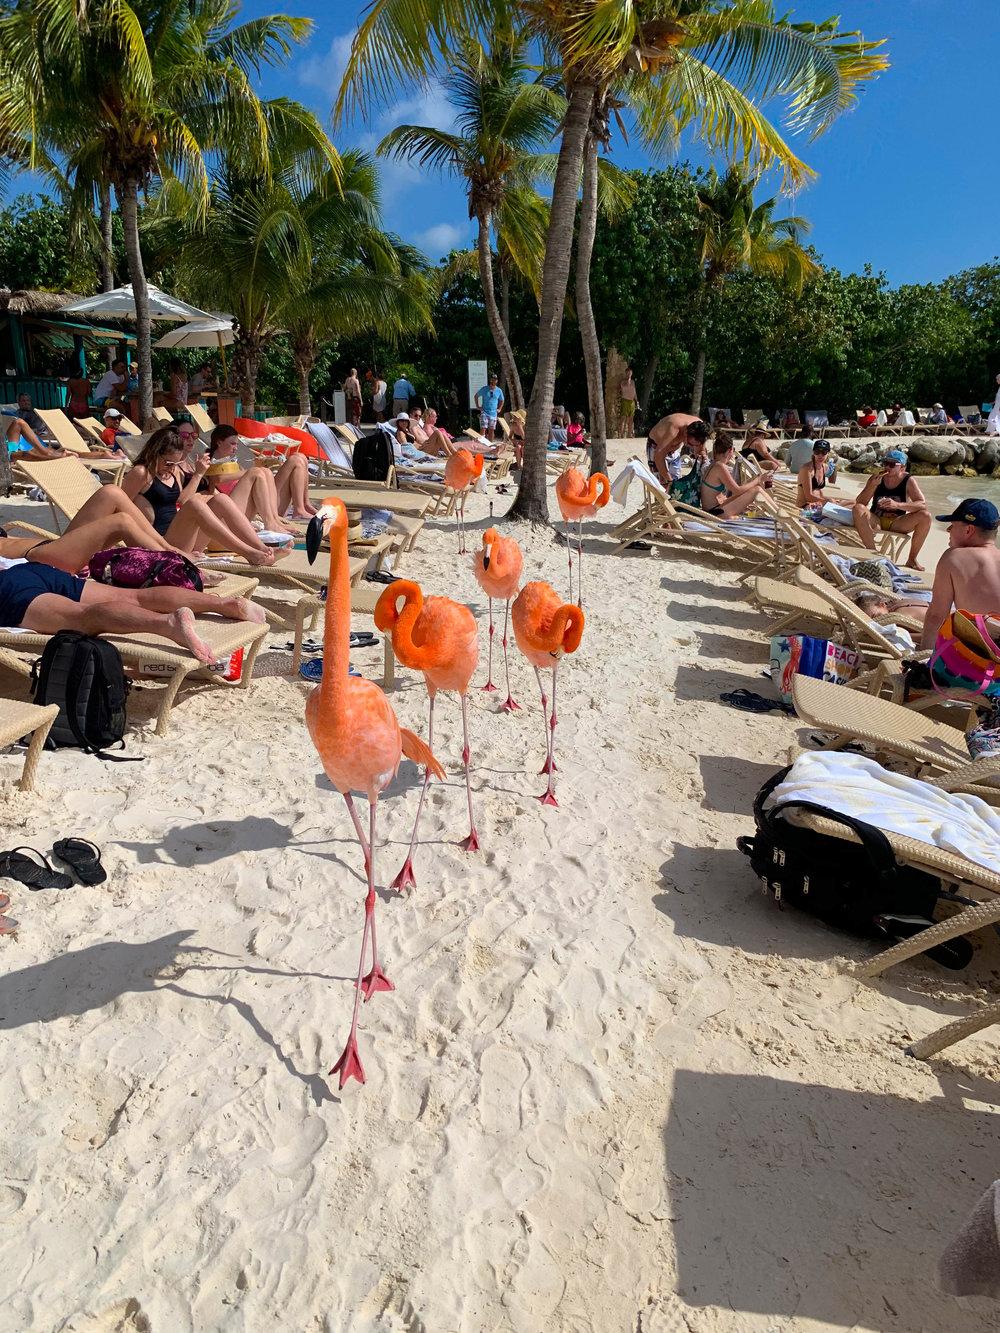 Aruba-Flamingo-Island-36.jpg